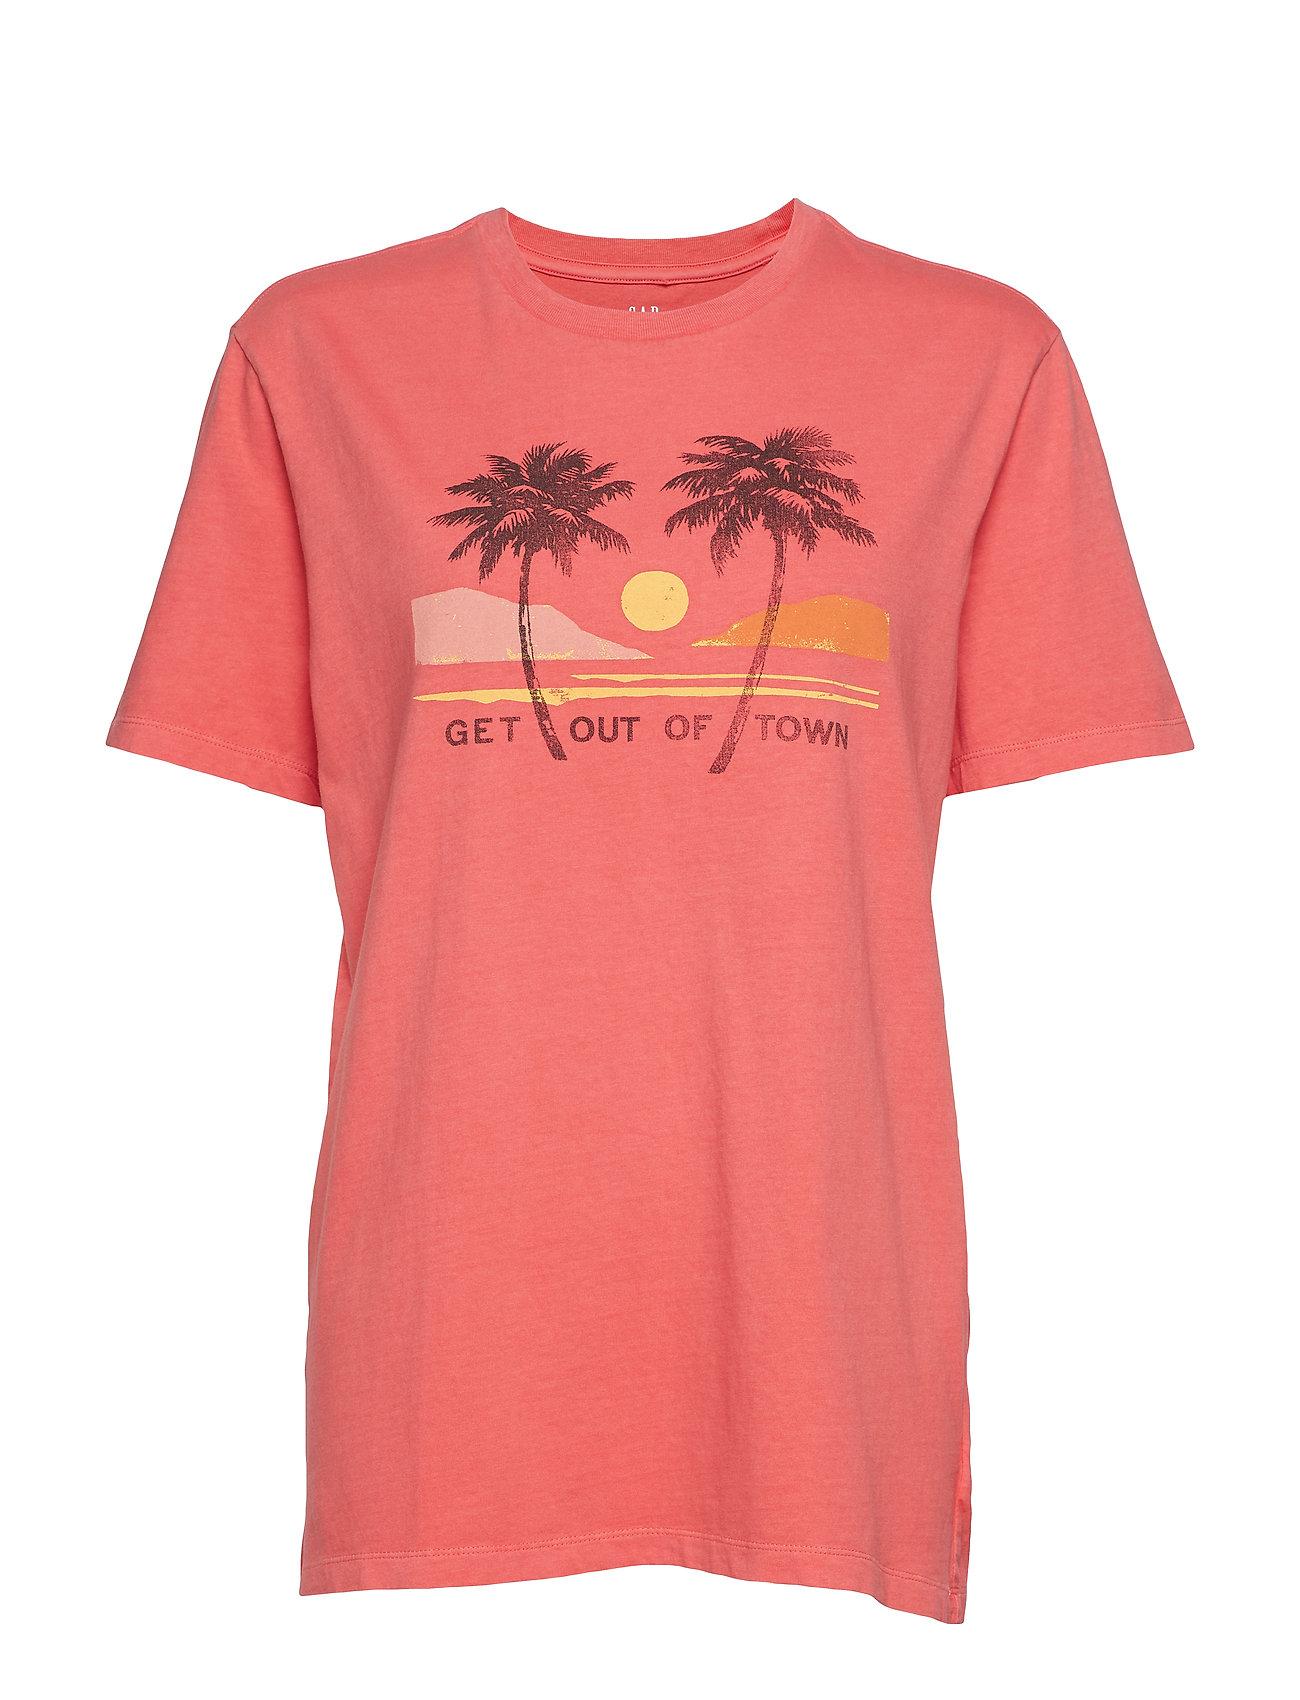 GAP Graphic Short Sleeve Crewneck T-Shirt - WATERMELON ICE